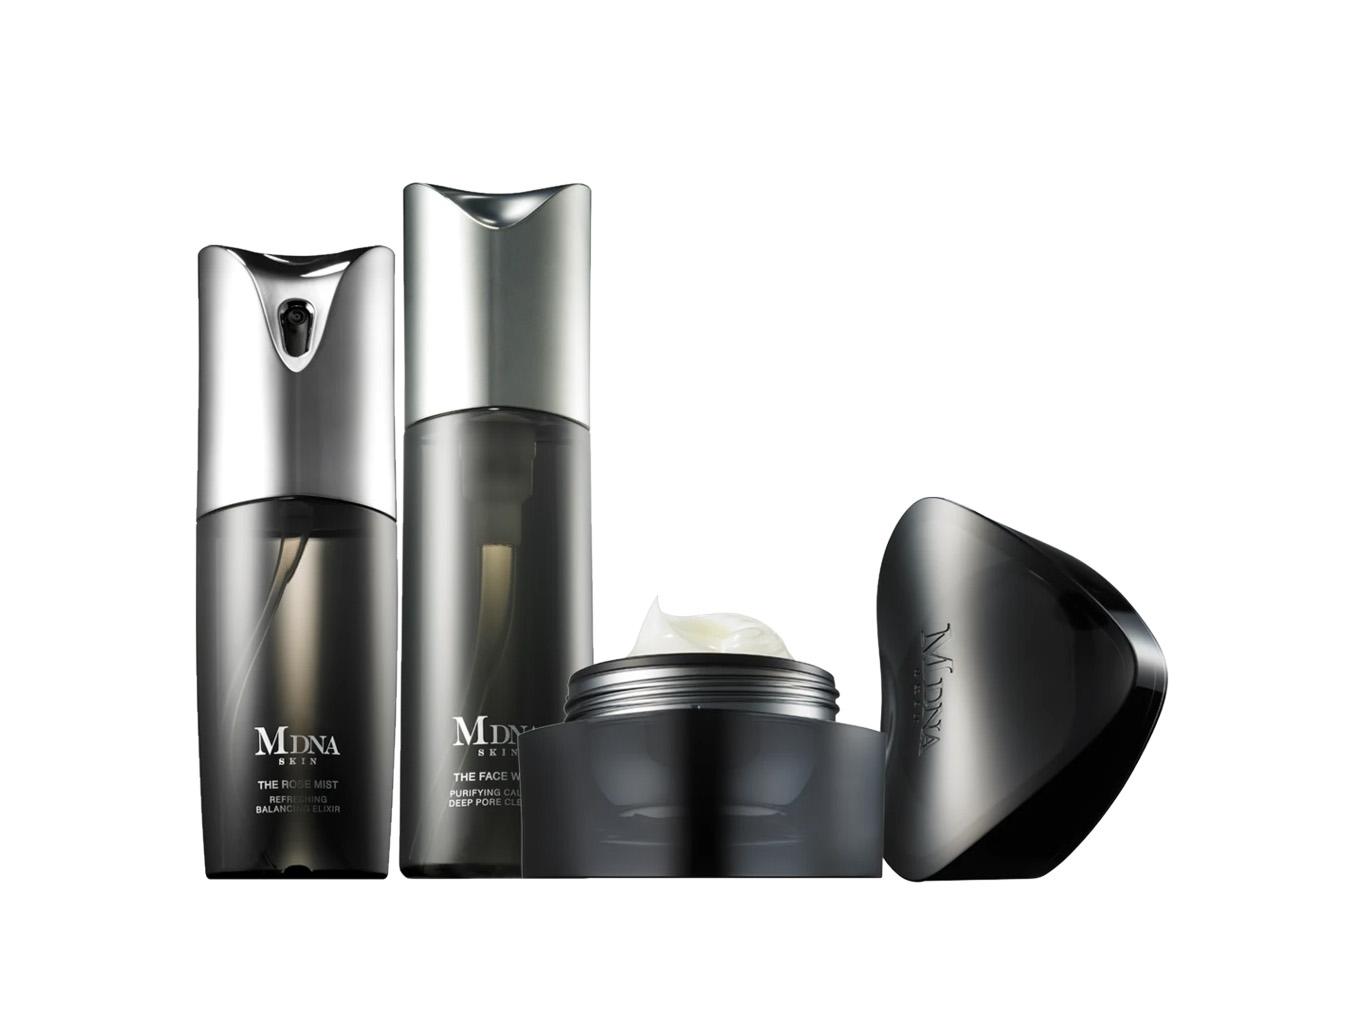 Best Celebrity Beauty Brands - MDNA Skin